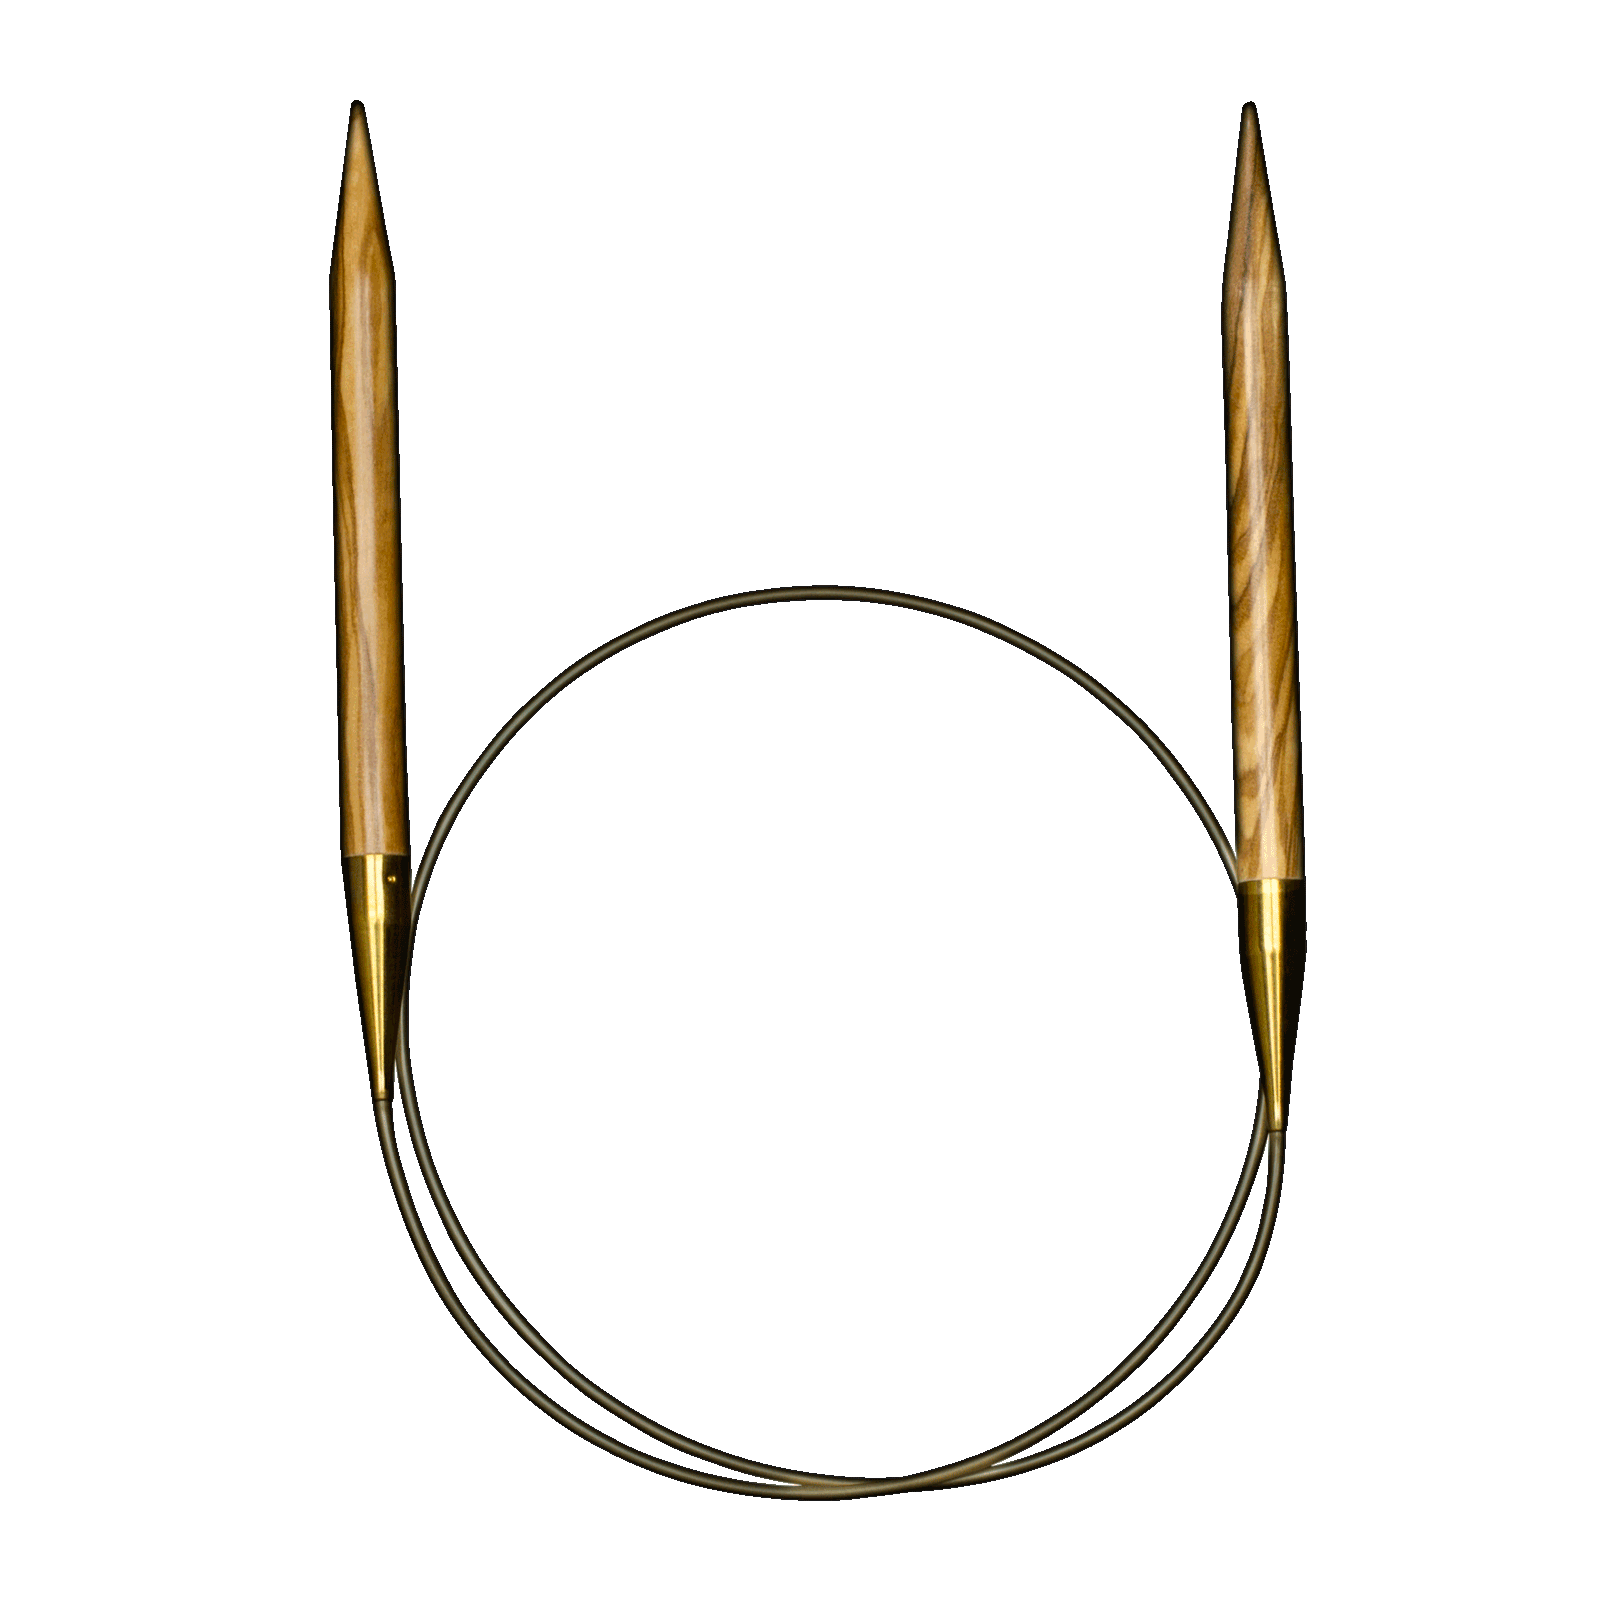 Addi Nature Olive 32 Circular Needles